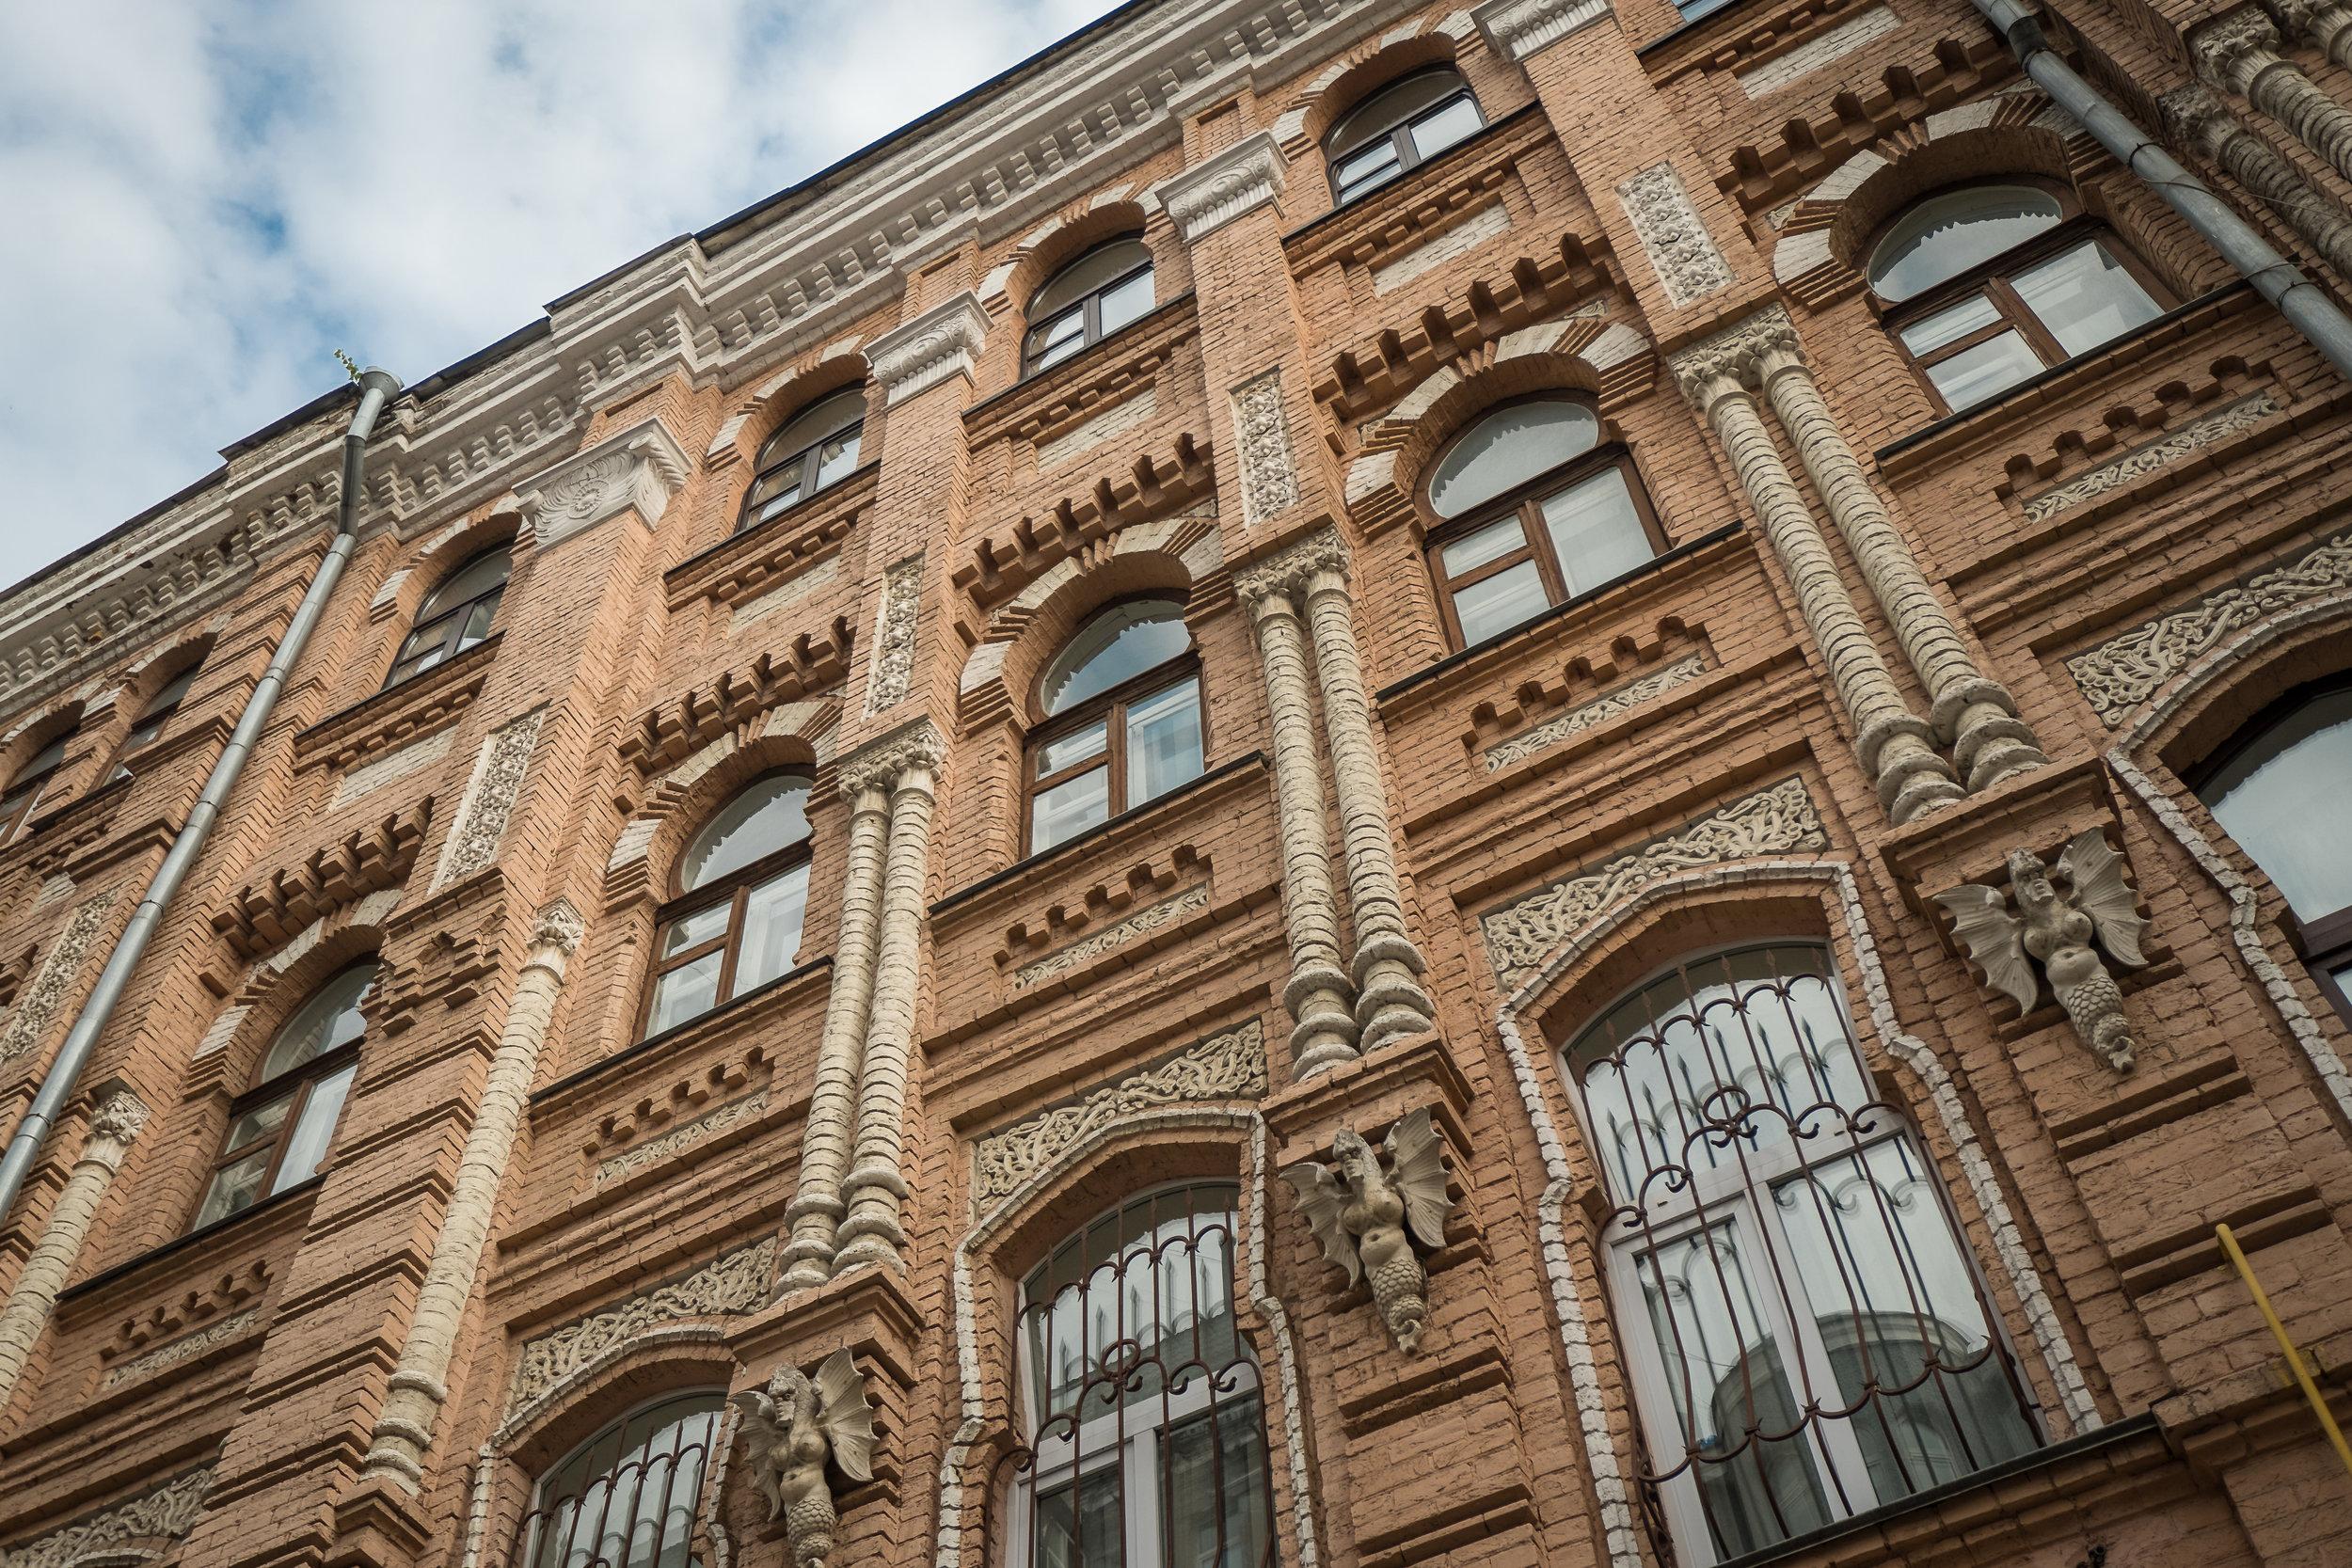 Kiev brick architecture-19.jpg